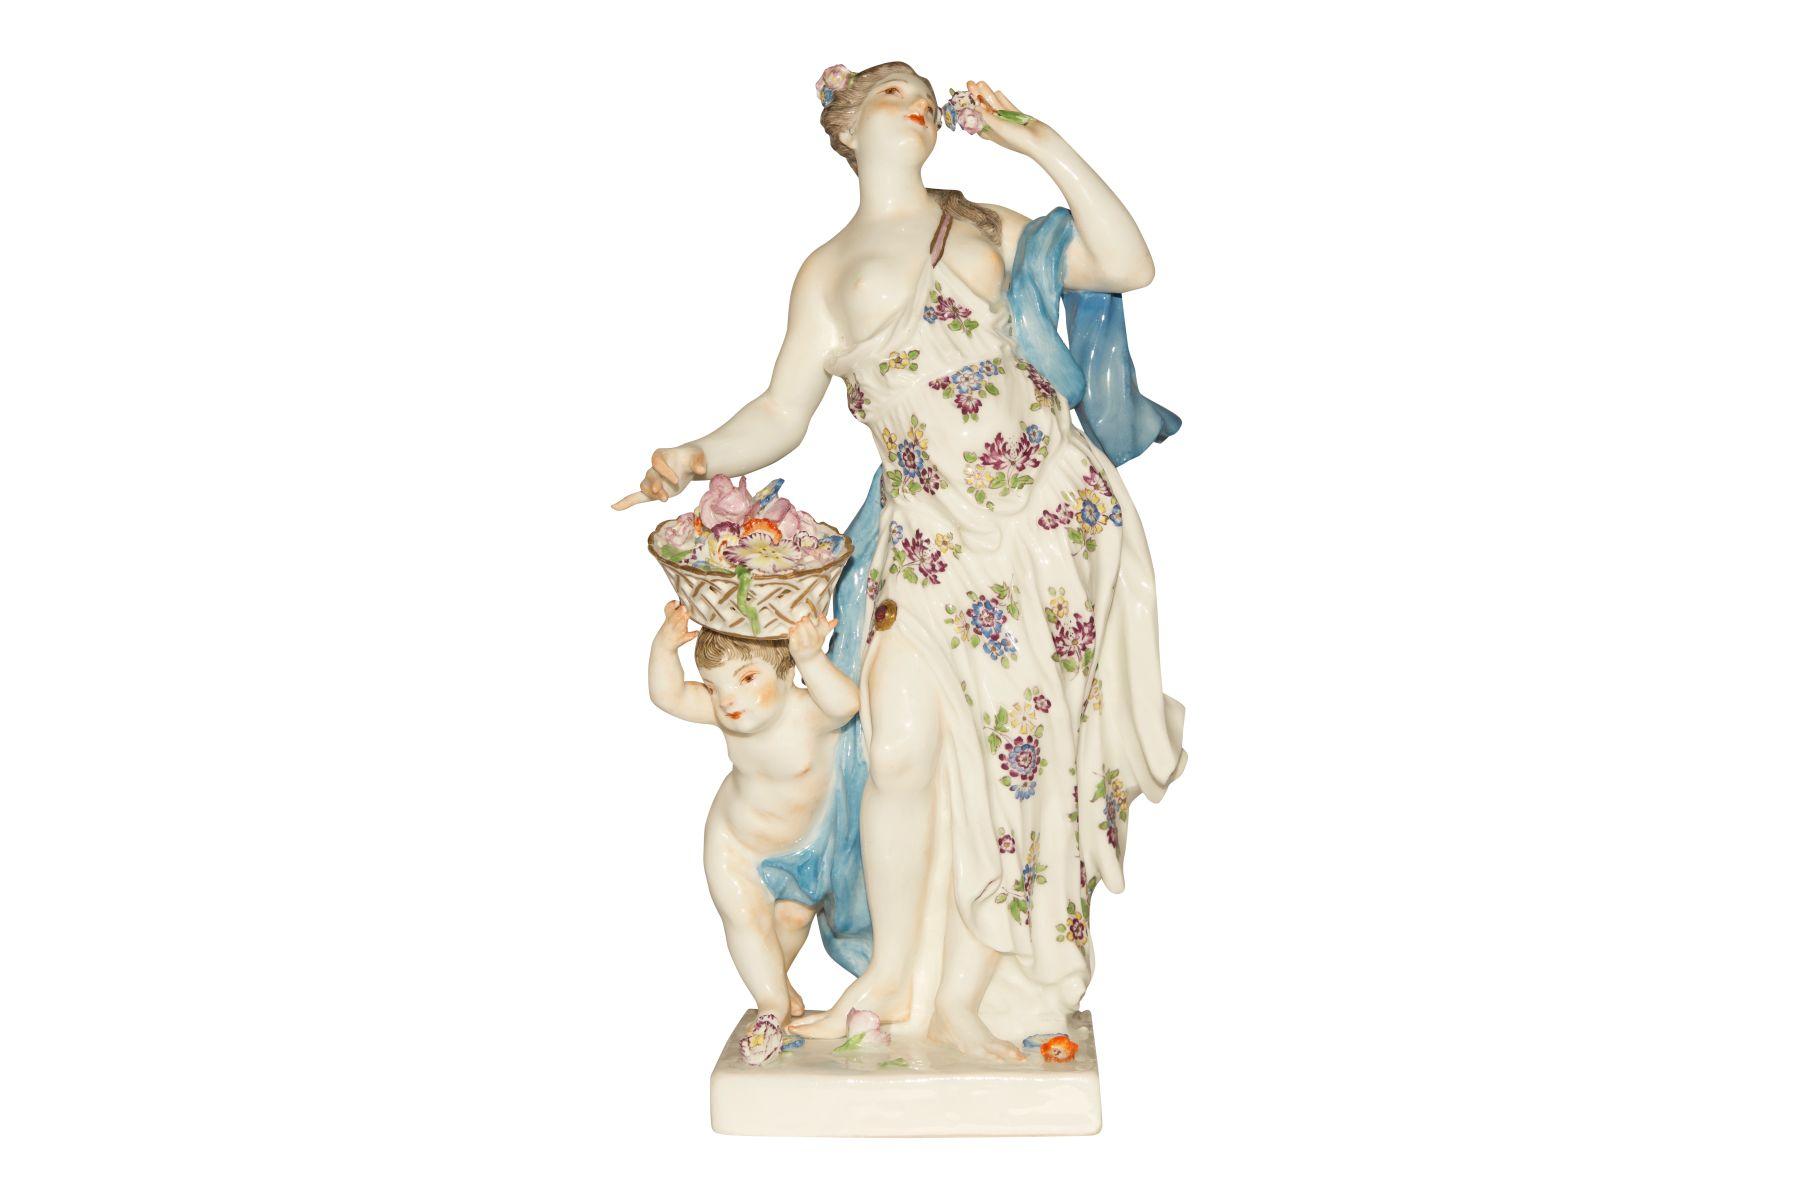 "#55 Spring figure Meissen 1750 | ""Frühling"" Figur Meissen 1750 Image"